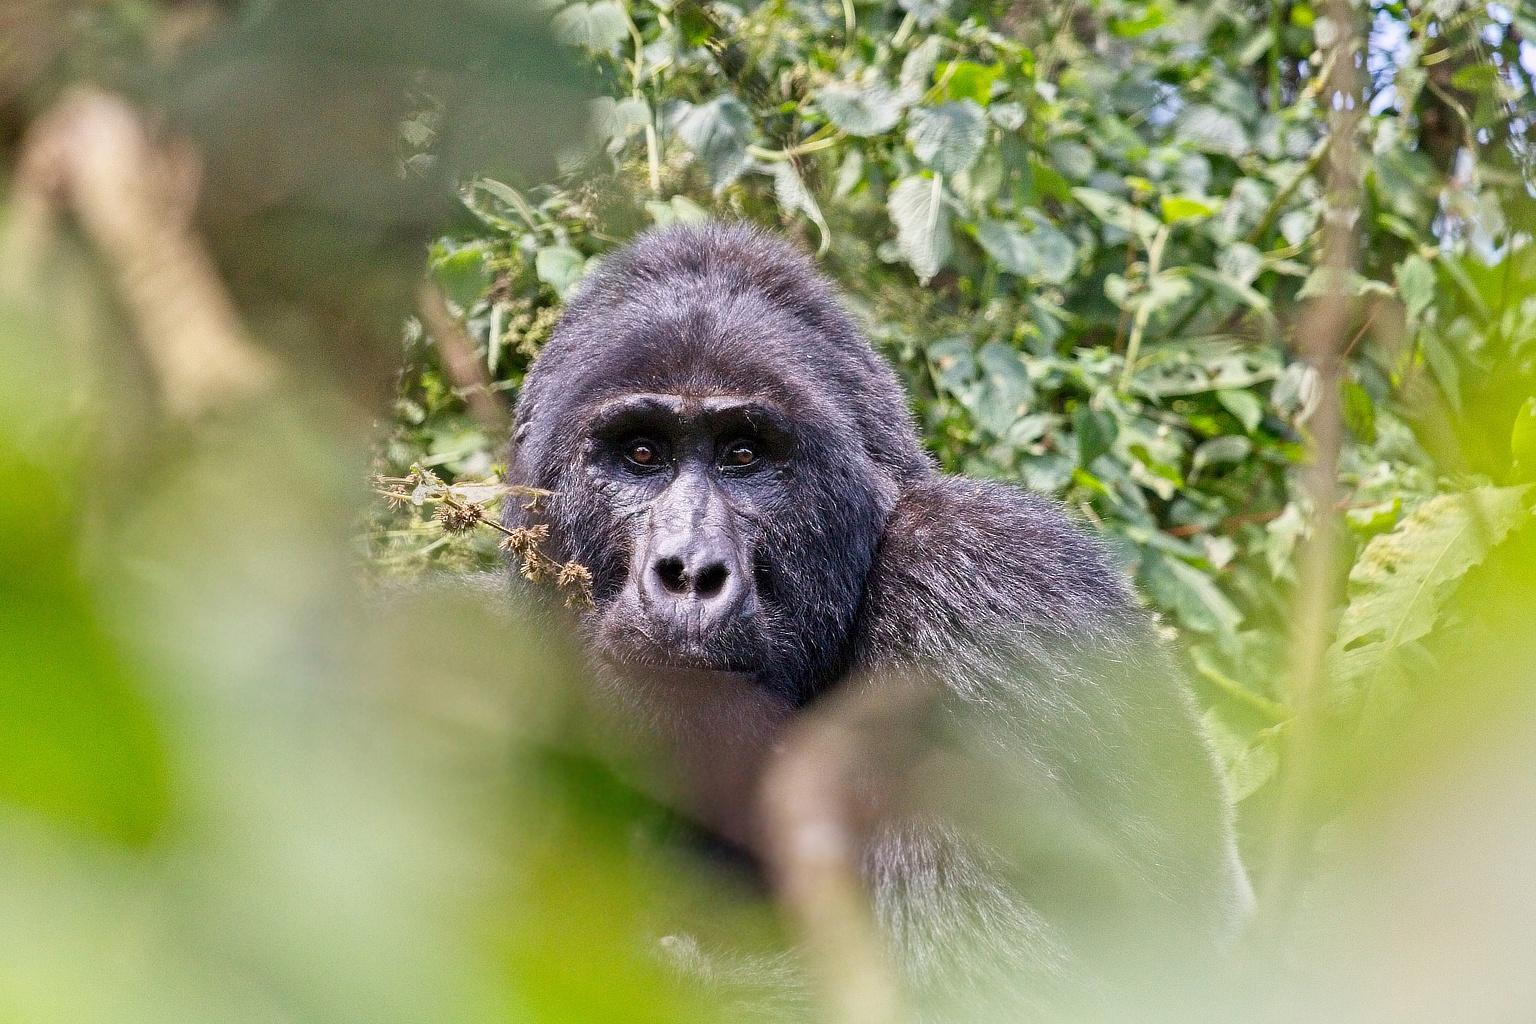 Gorilla Habituation pagina